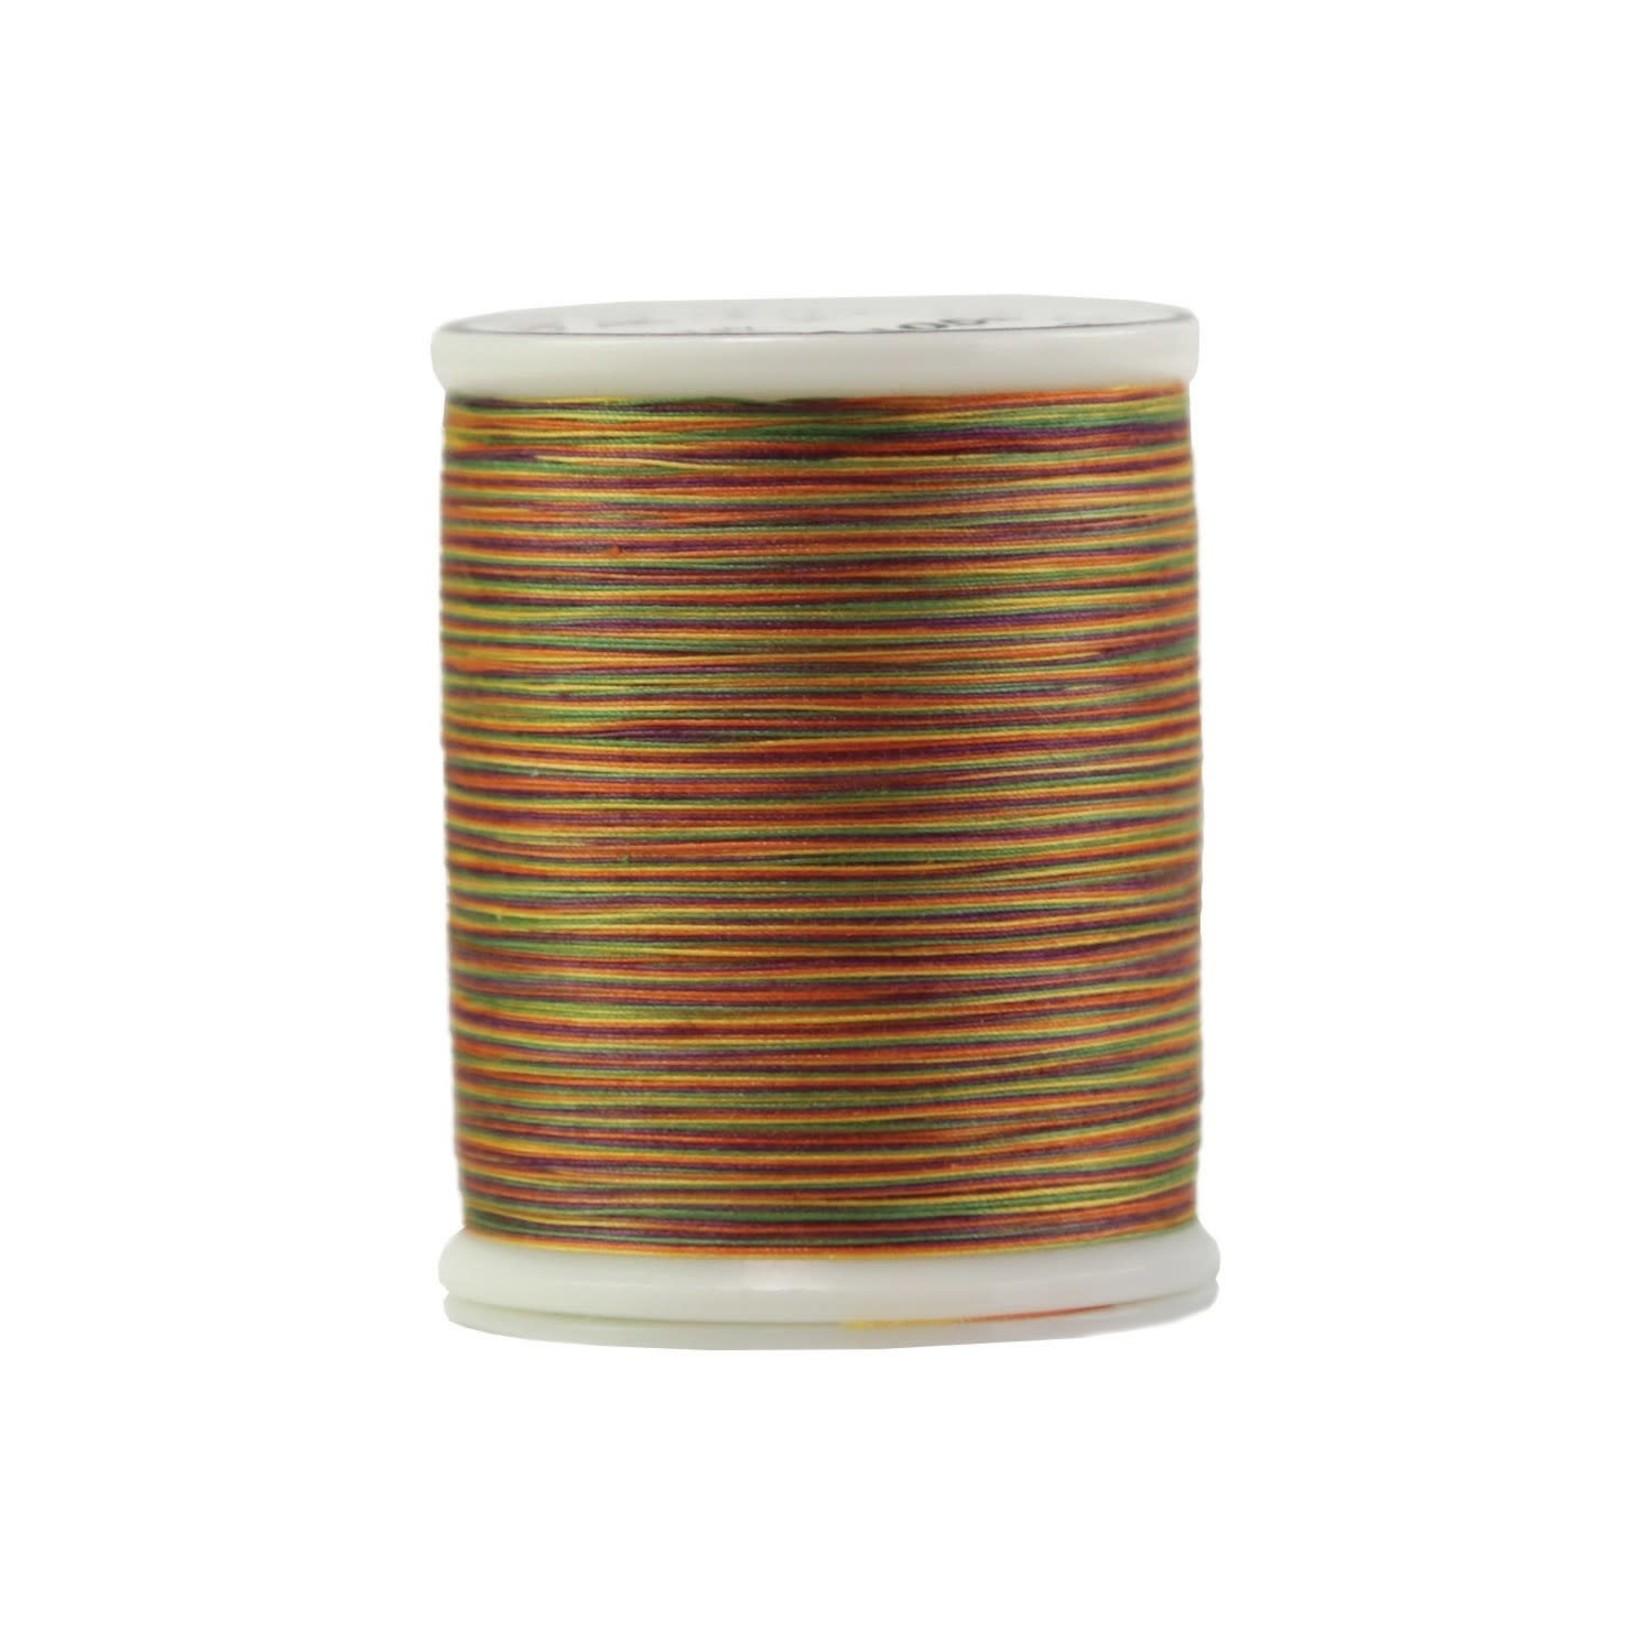 Superior Threads King Tut - #40 - 457 m - 1059 Market Place